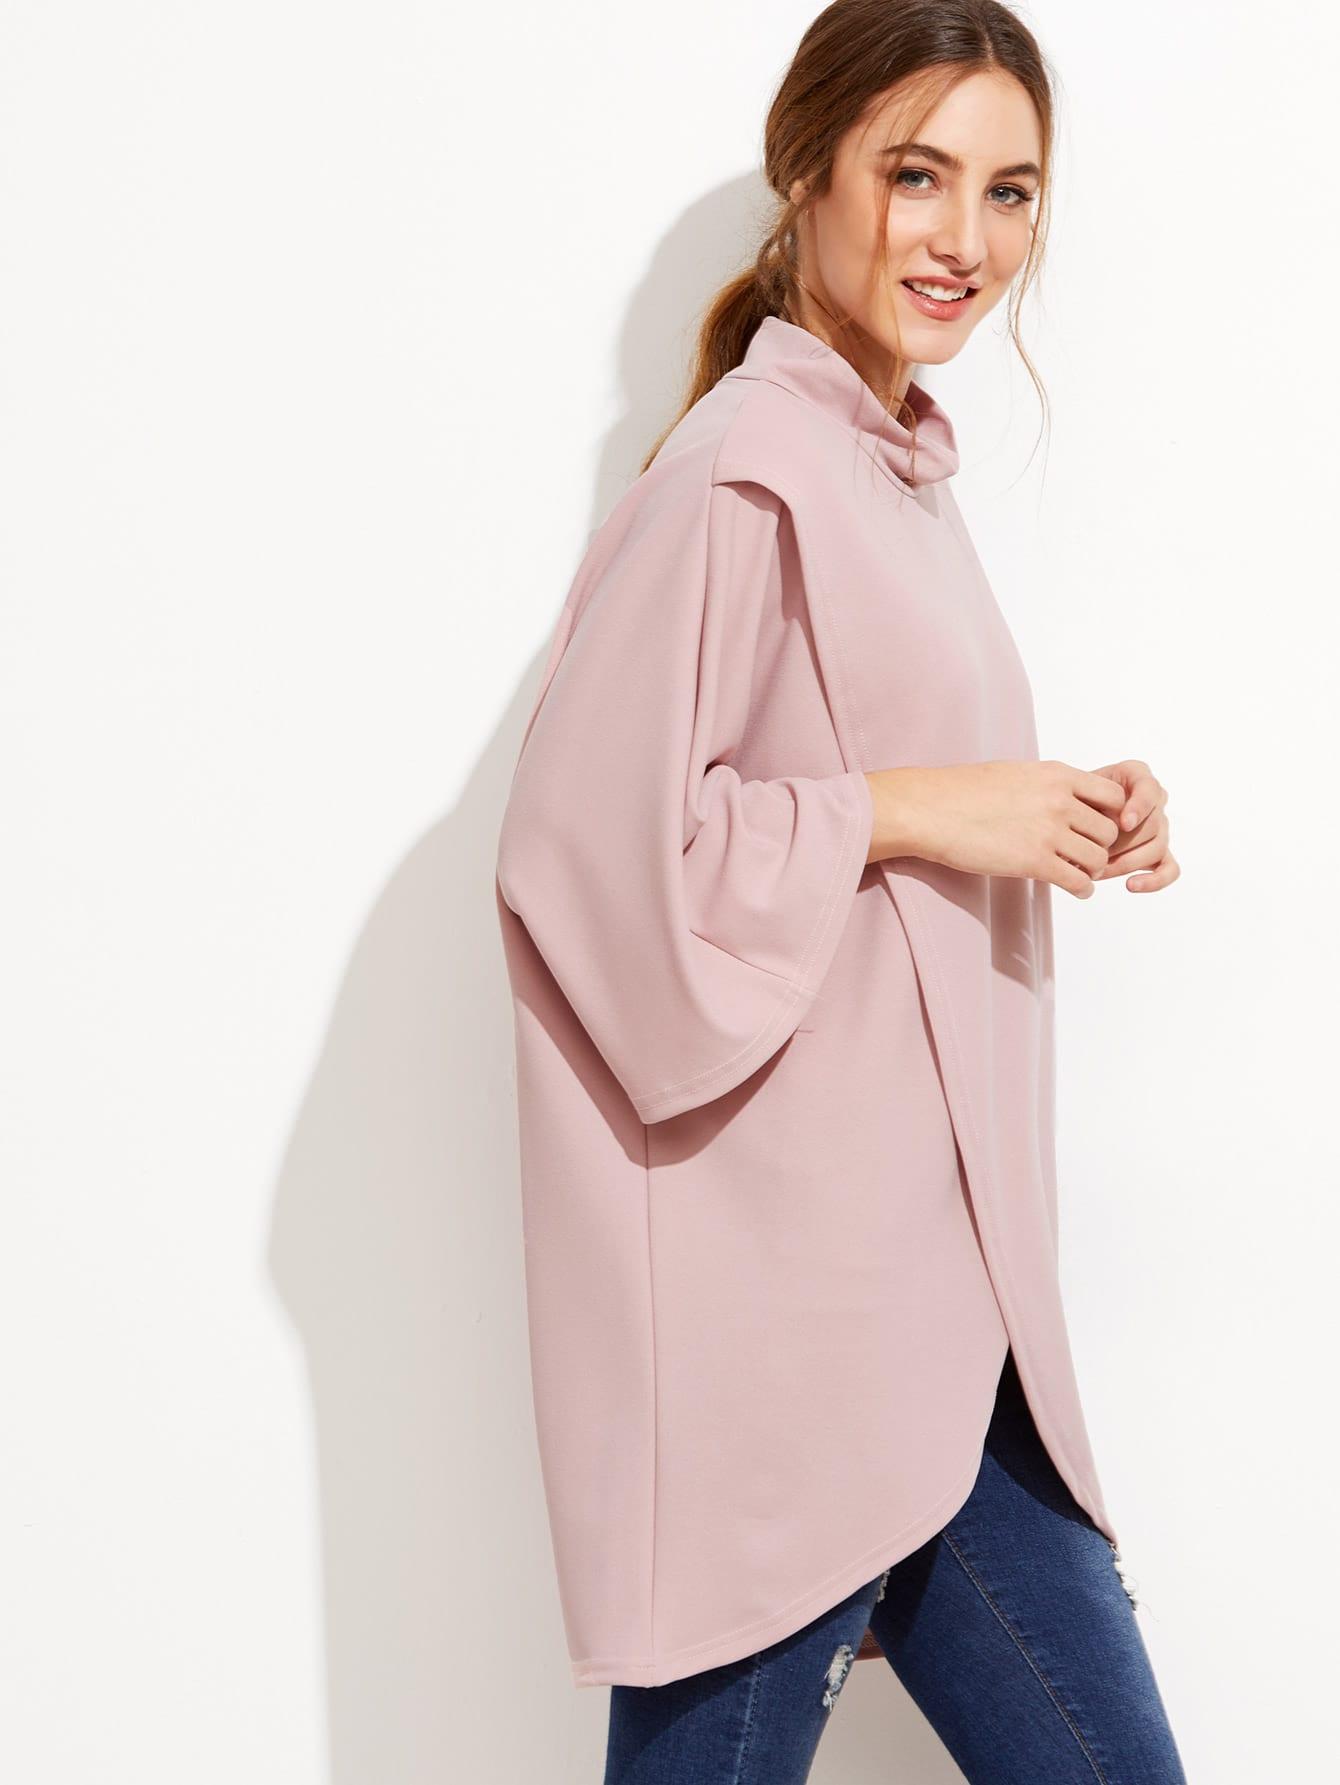 blouse160926303_2